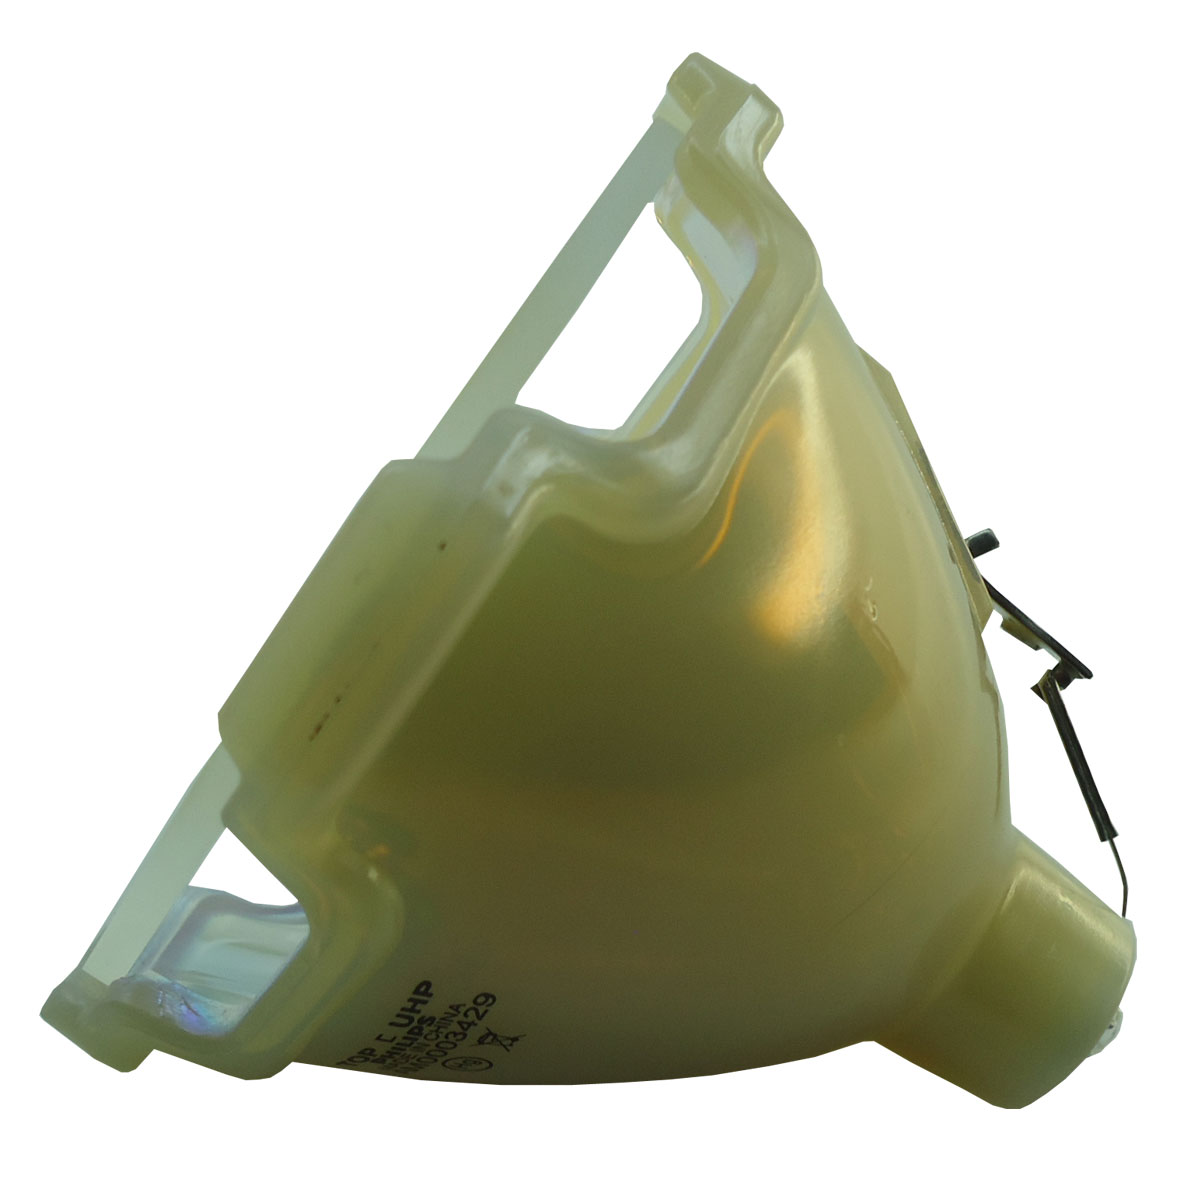 Lutema Platinum for Christie LX66 Projector Lamp (Original Philips Bulb) - image 2 de 5